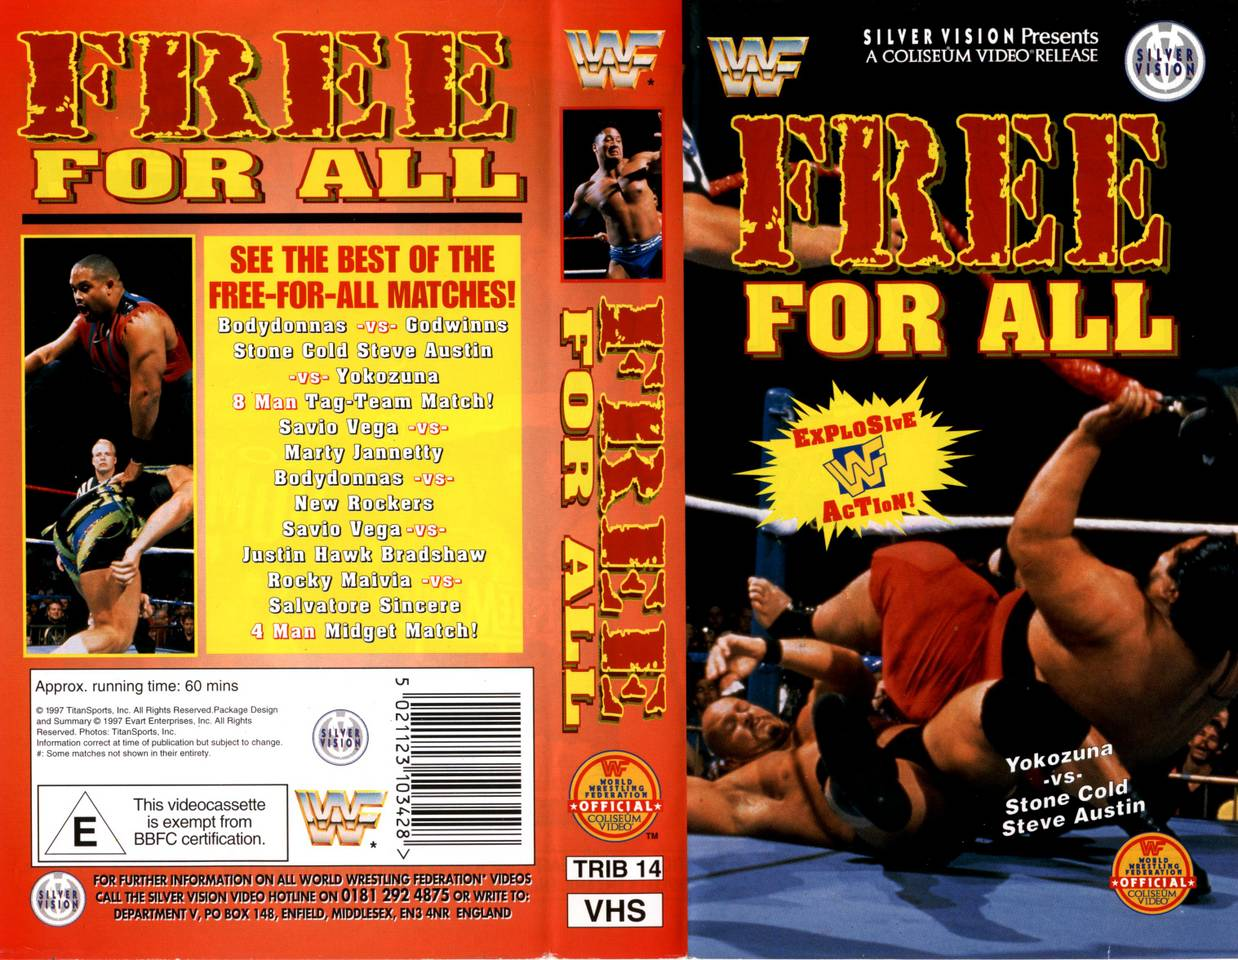 freeforall3rf